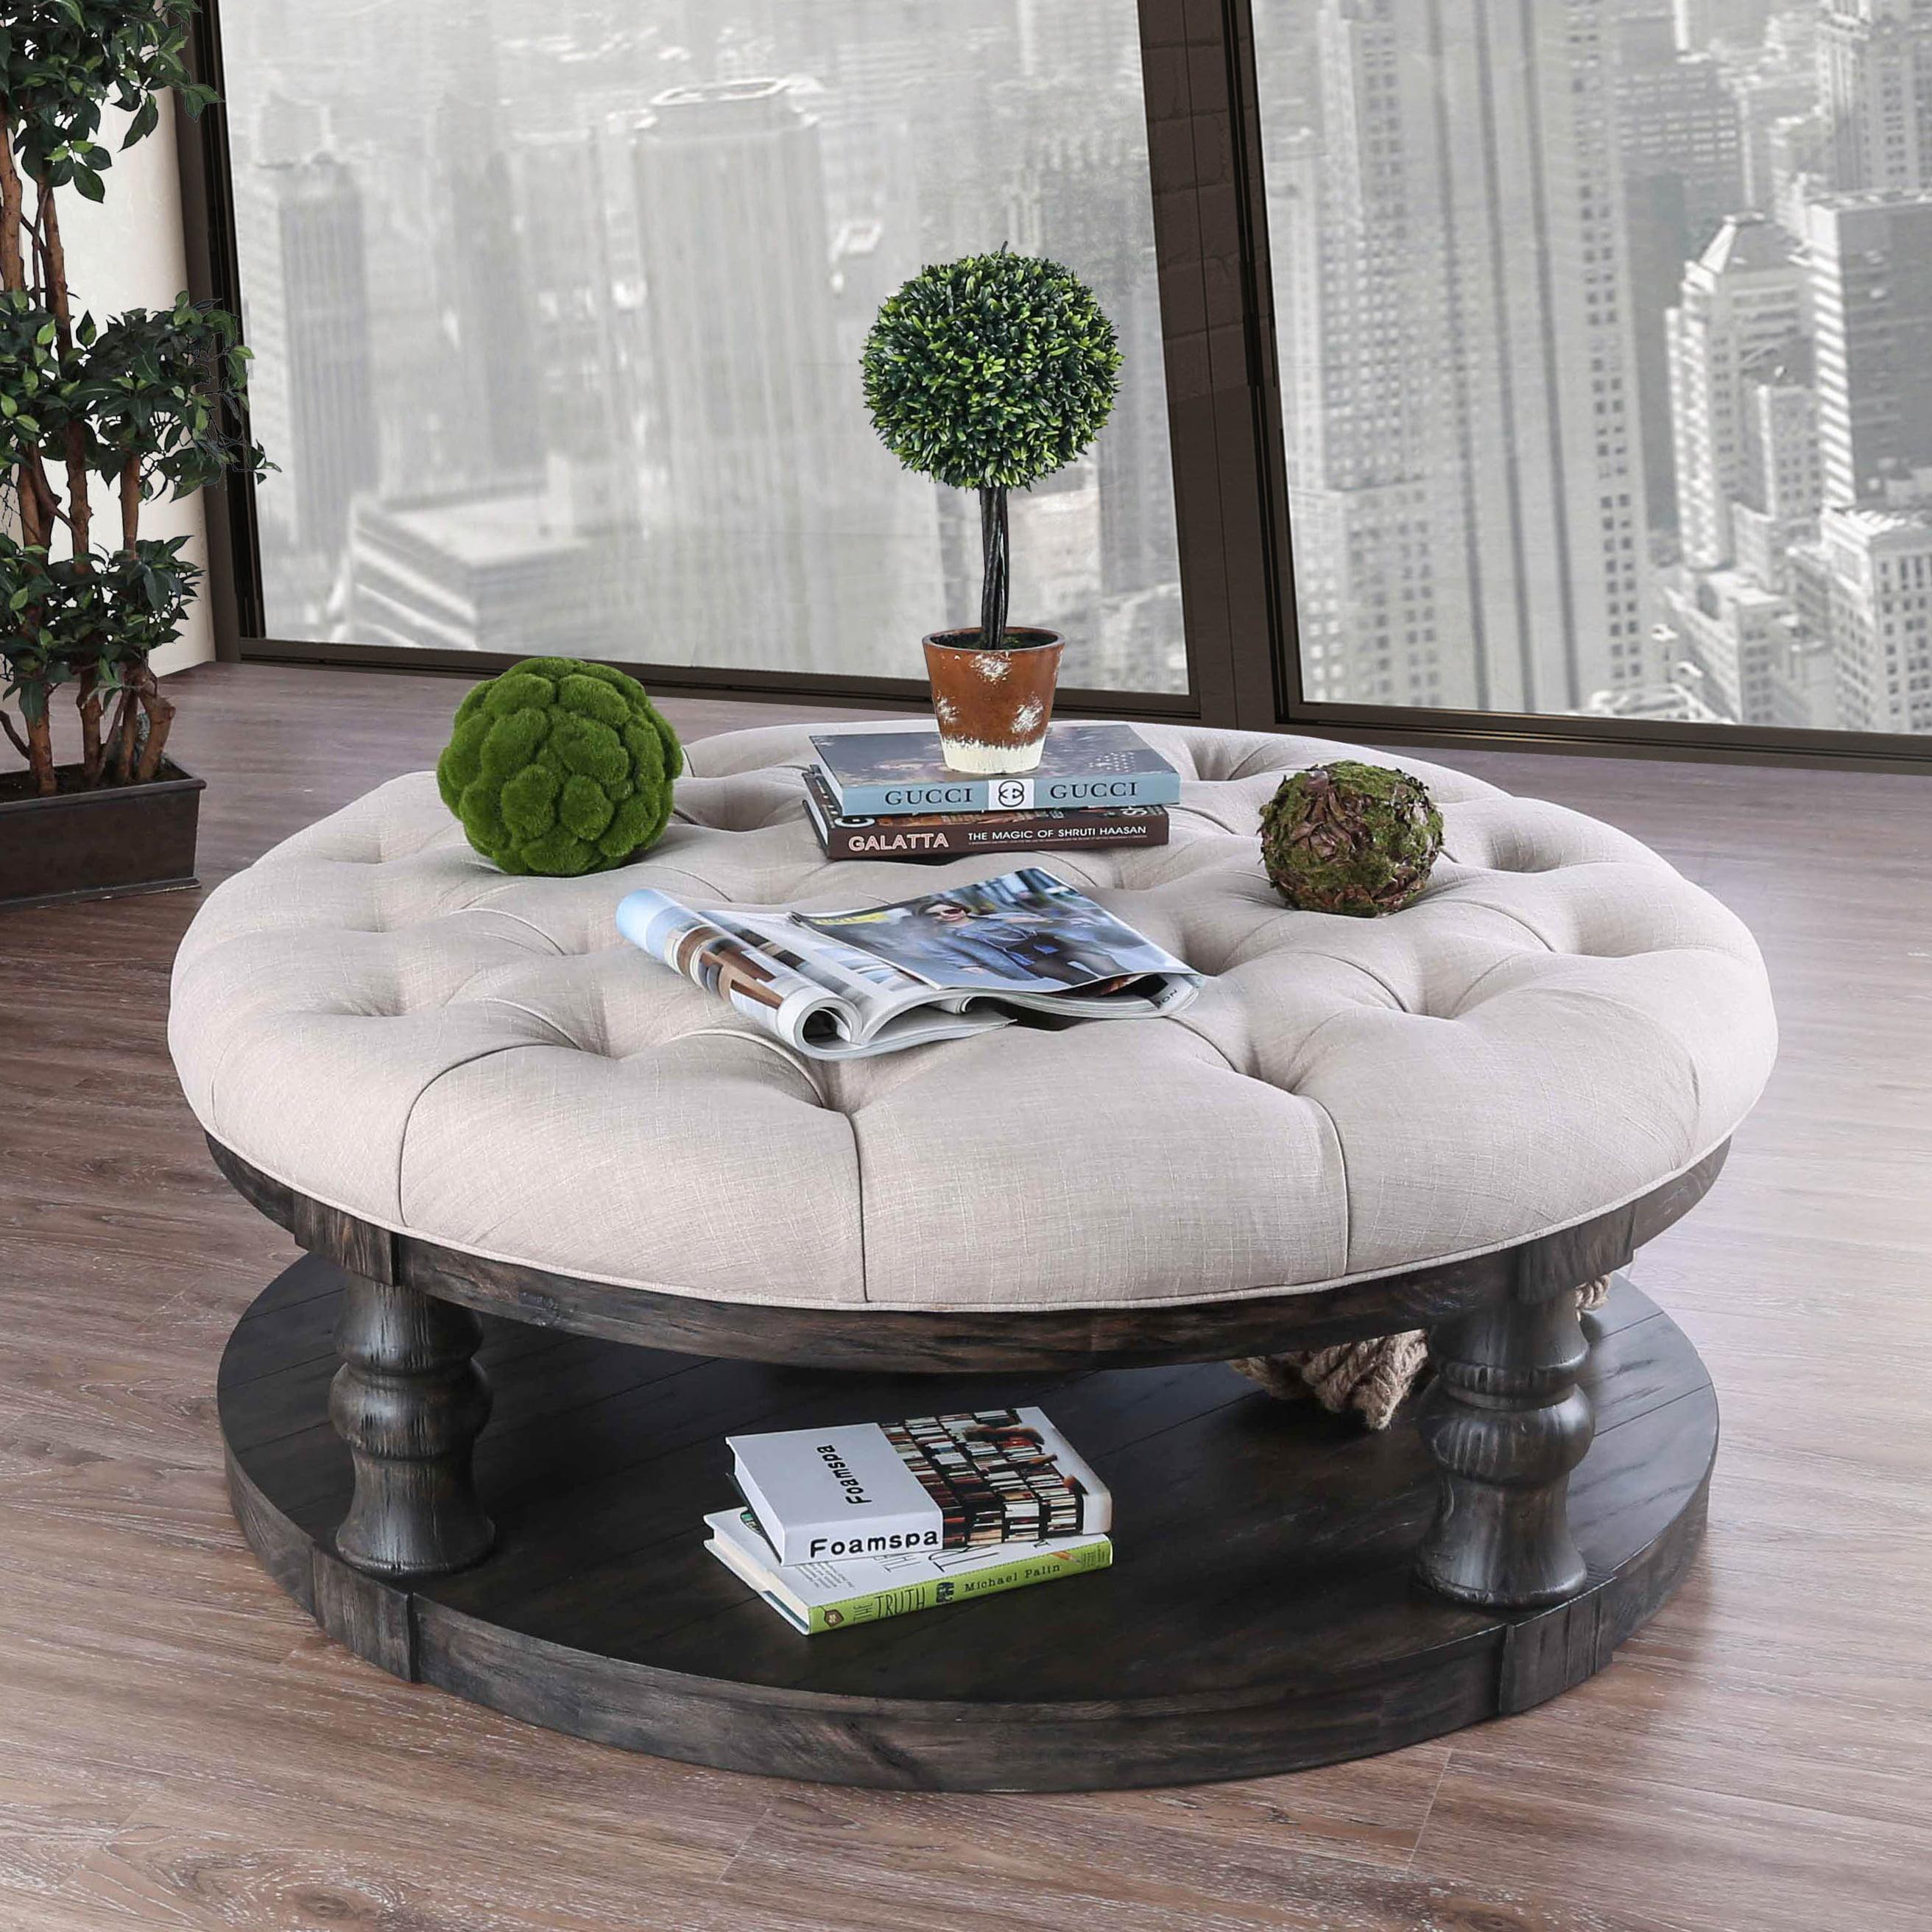 Tanenbaum Transitional Round Ottoman Coffee Table Antique Gray